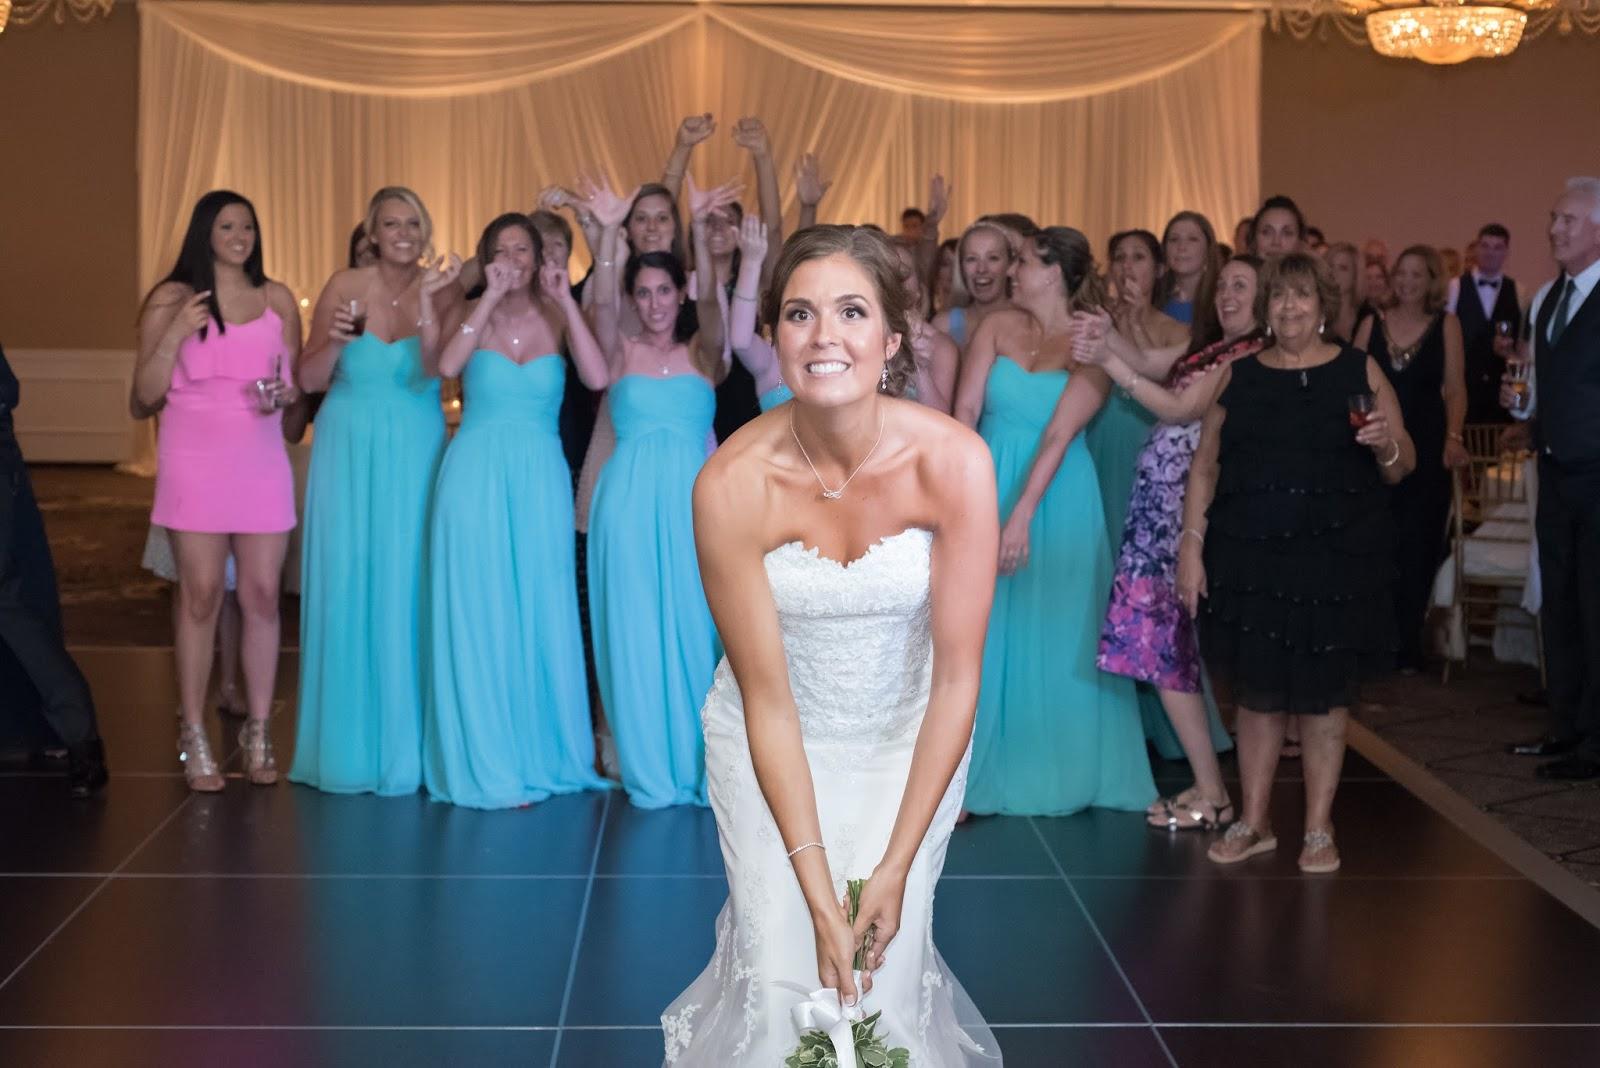 Calm Weddings